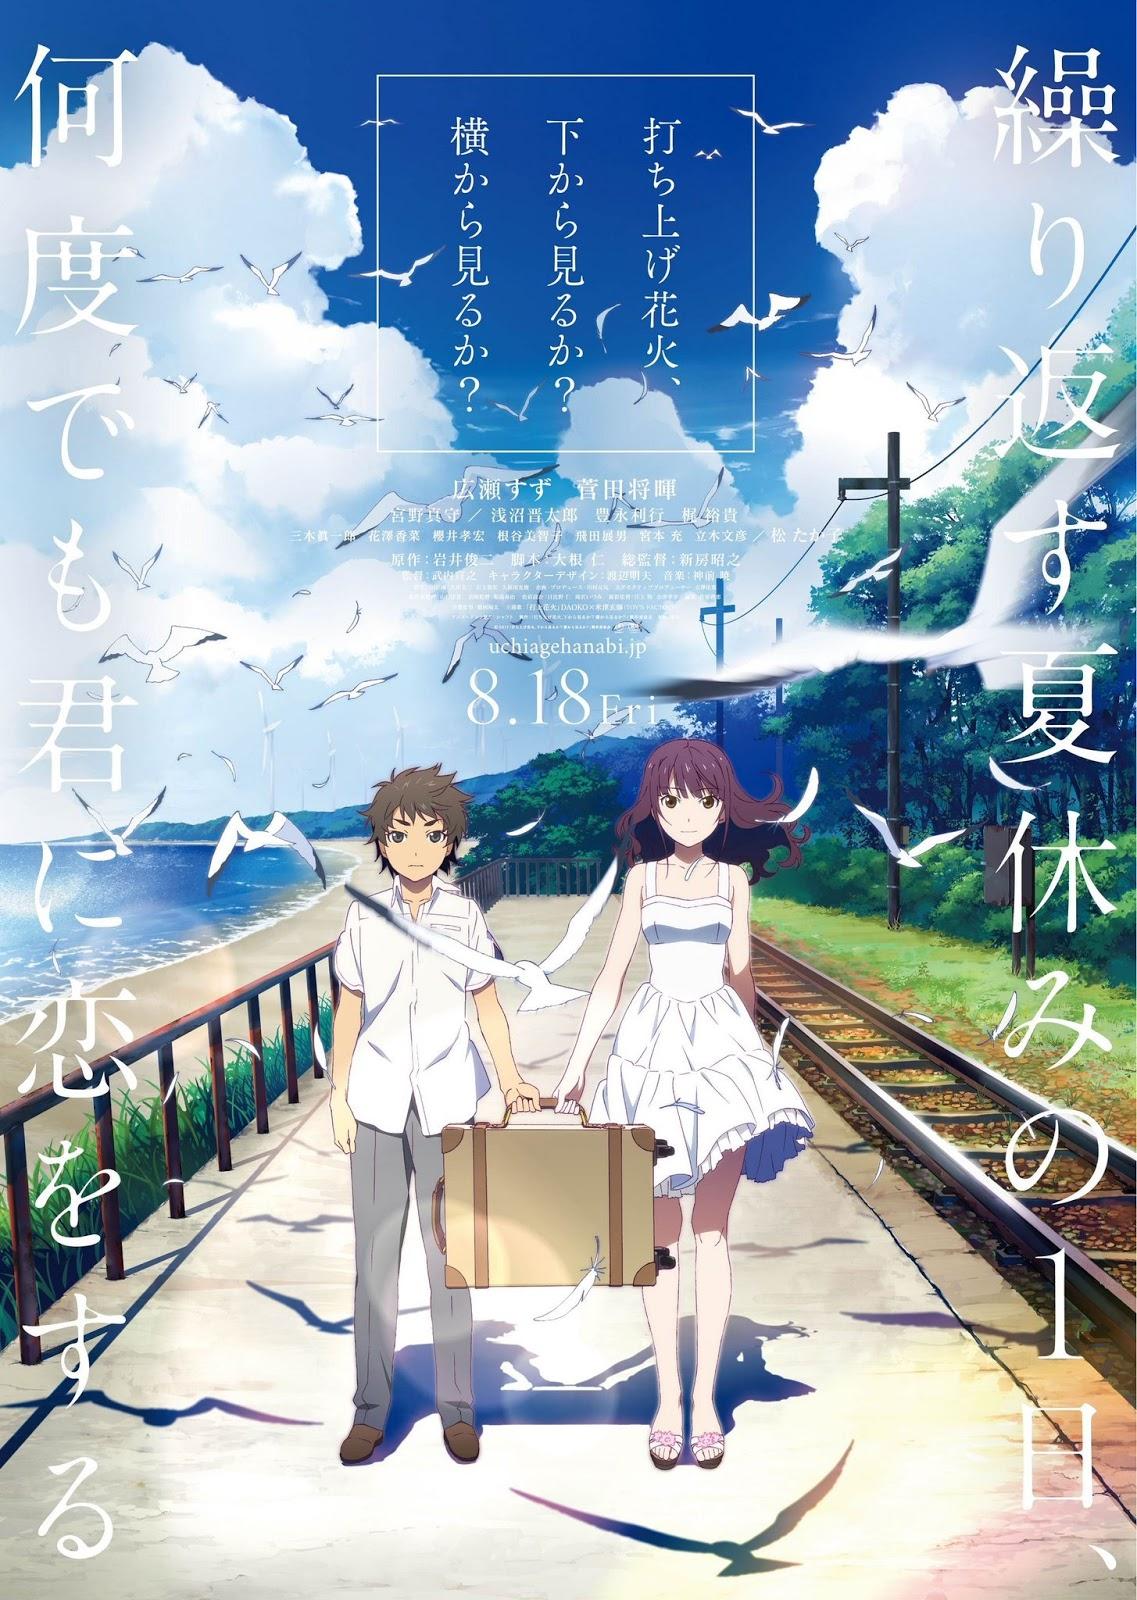 Download The Uchiage Hanabi Movie Sub Indo Anime